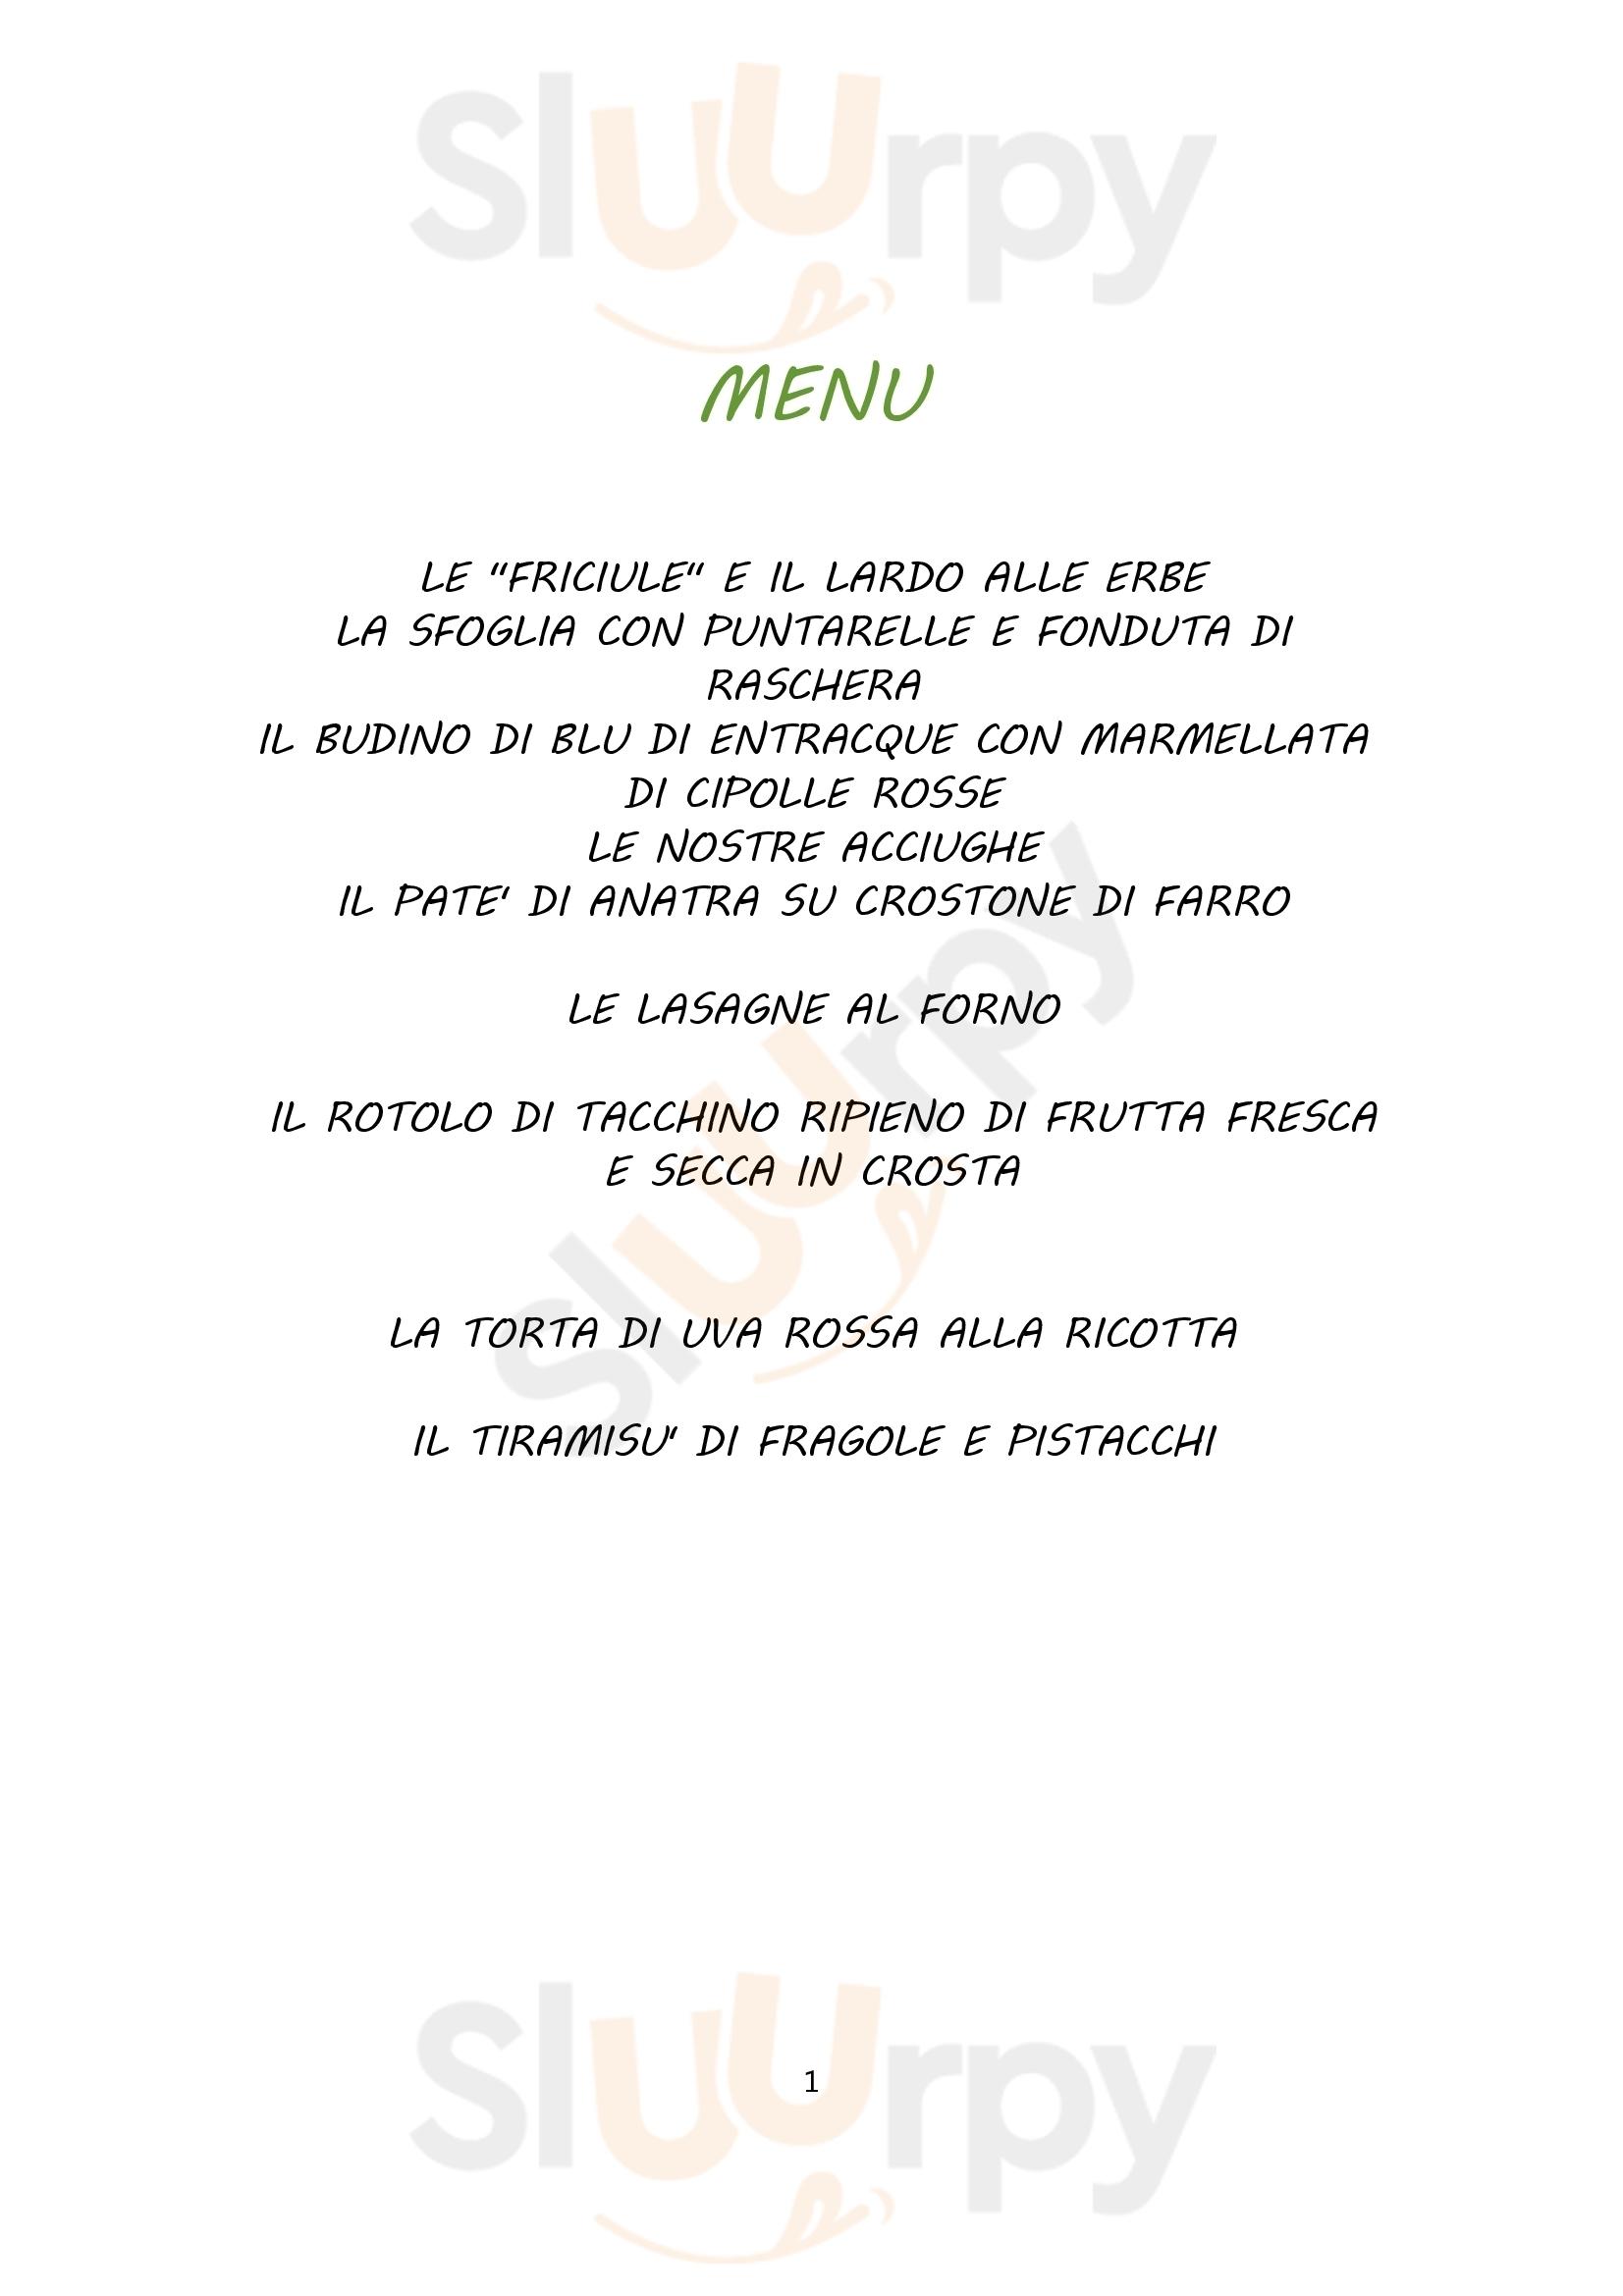 Mulino Delle Ortensie Gaiola menù 1 pagina